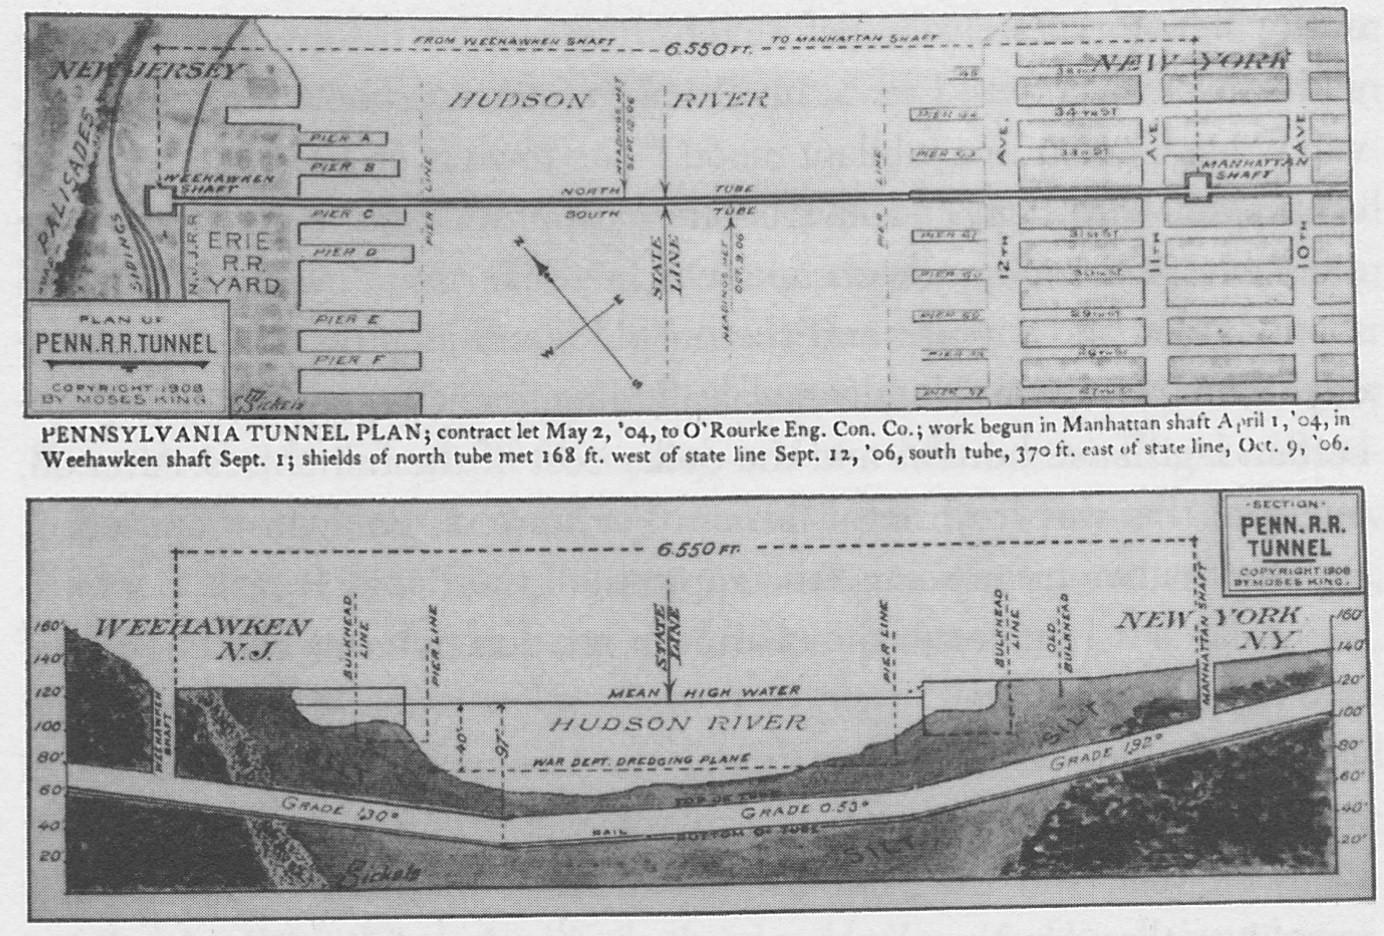 Penn Station Pathfinder Maps Amp Models Railroad Track